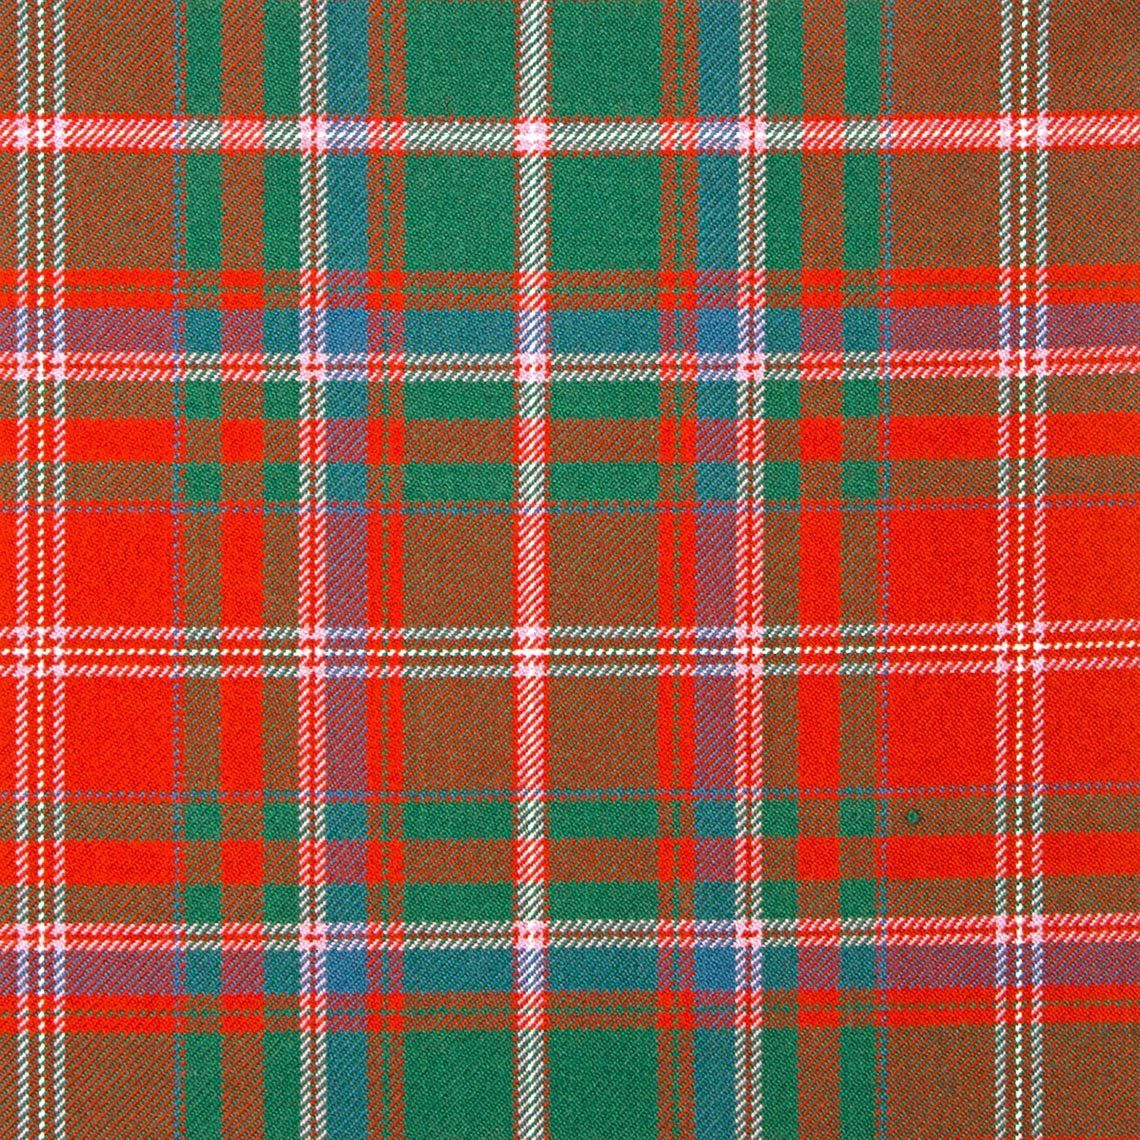 MacDougall (Ancient) Kilt